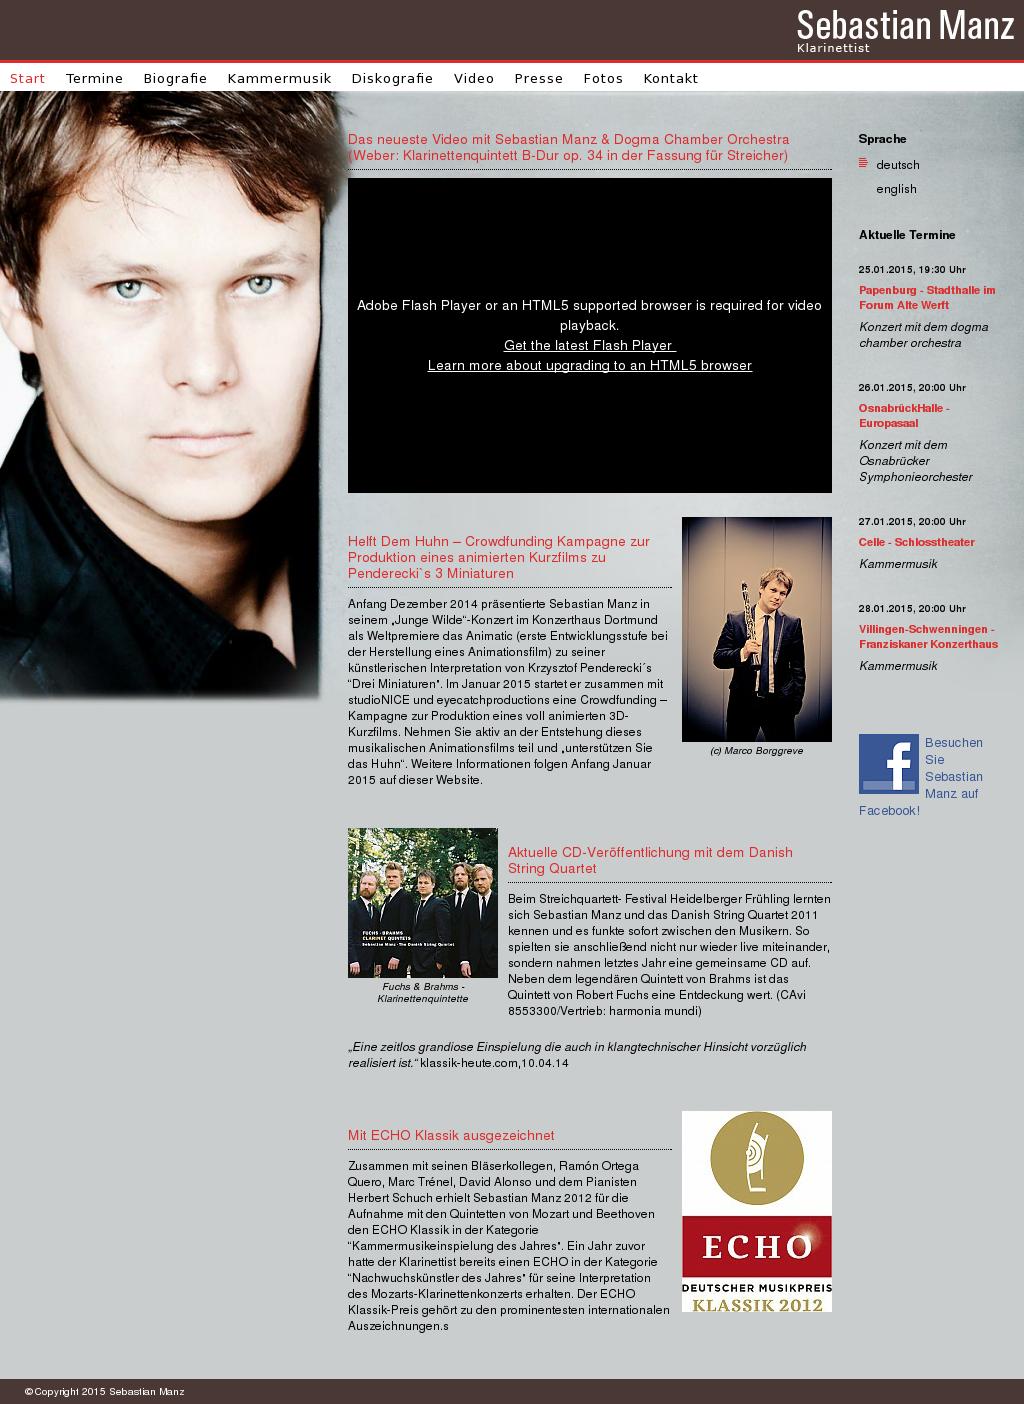 Sebastian Manz Competitors, Revenue and Employees - Owler